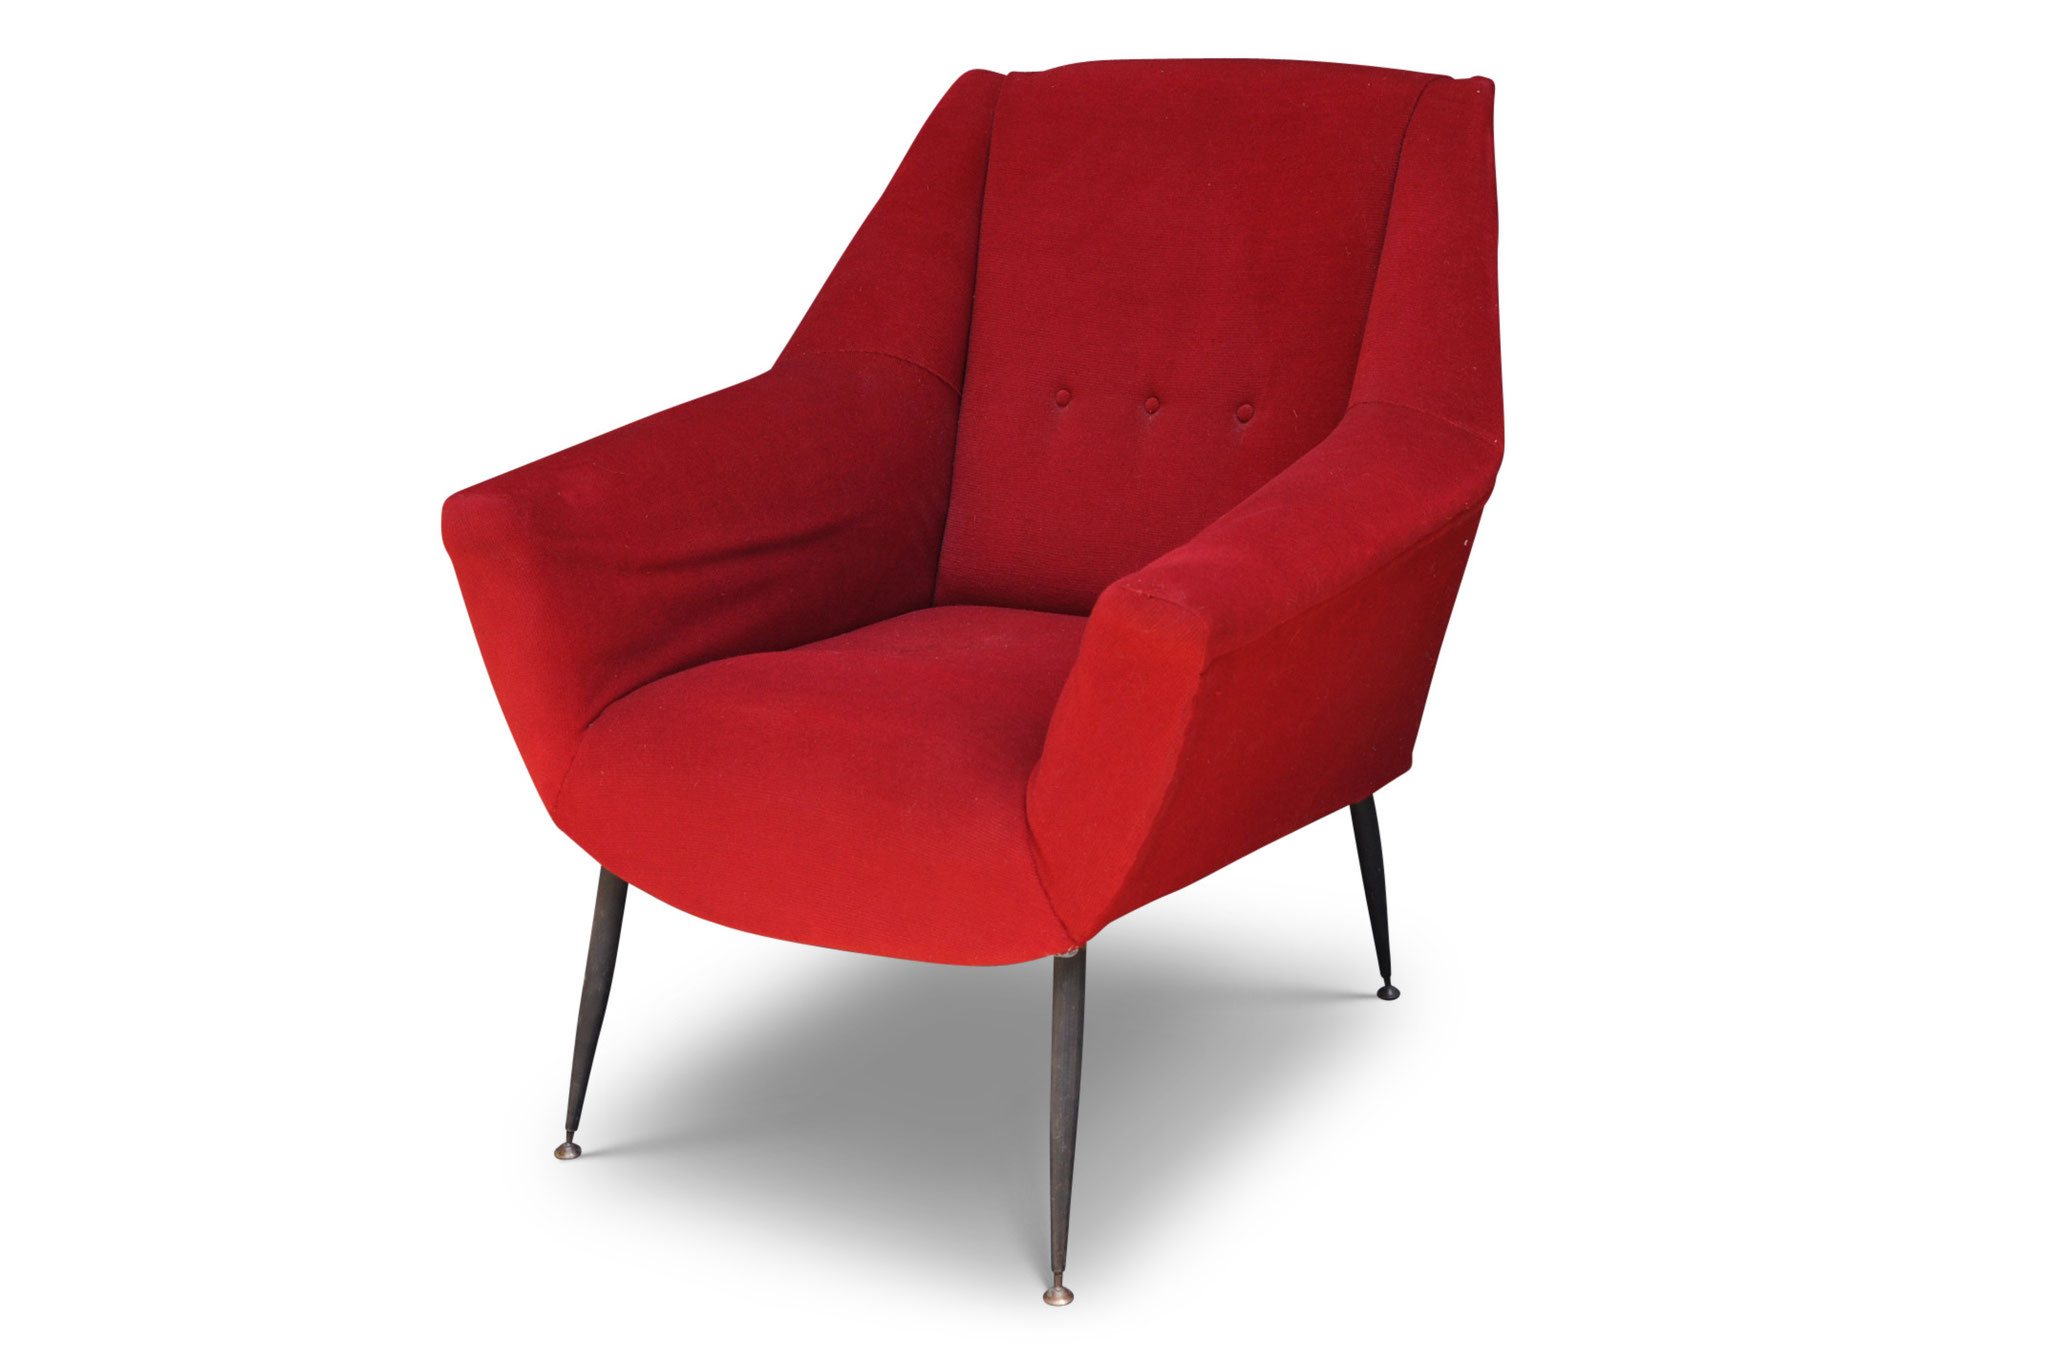 Poltrone Gigi Radice chair mid century modern